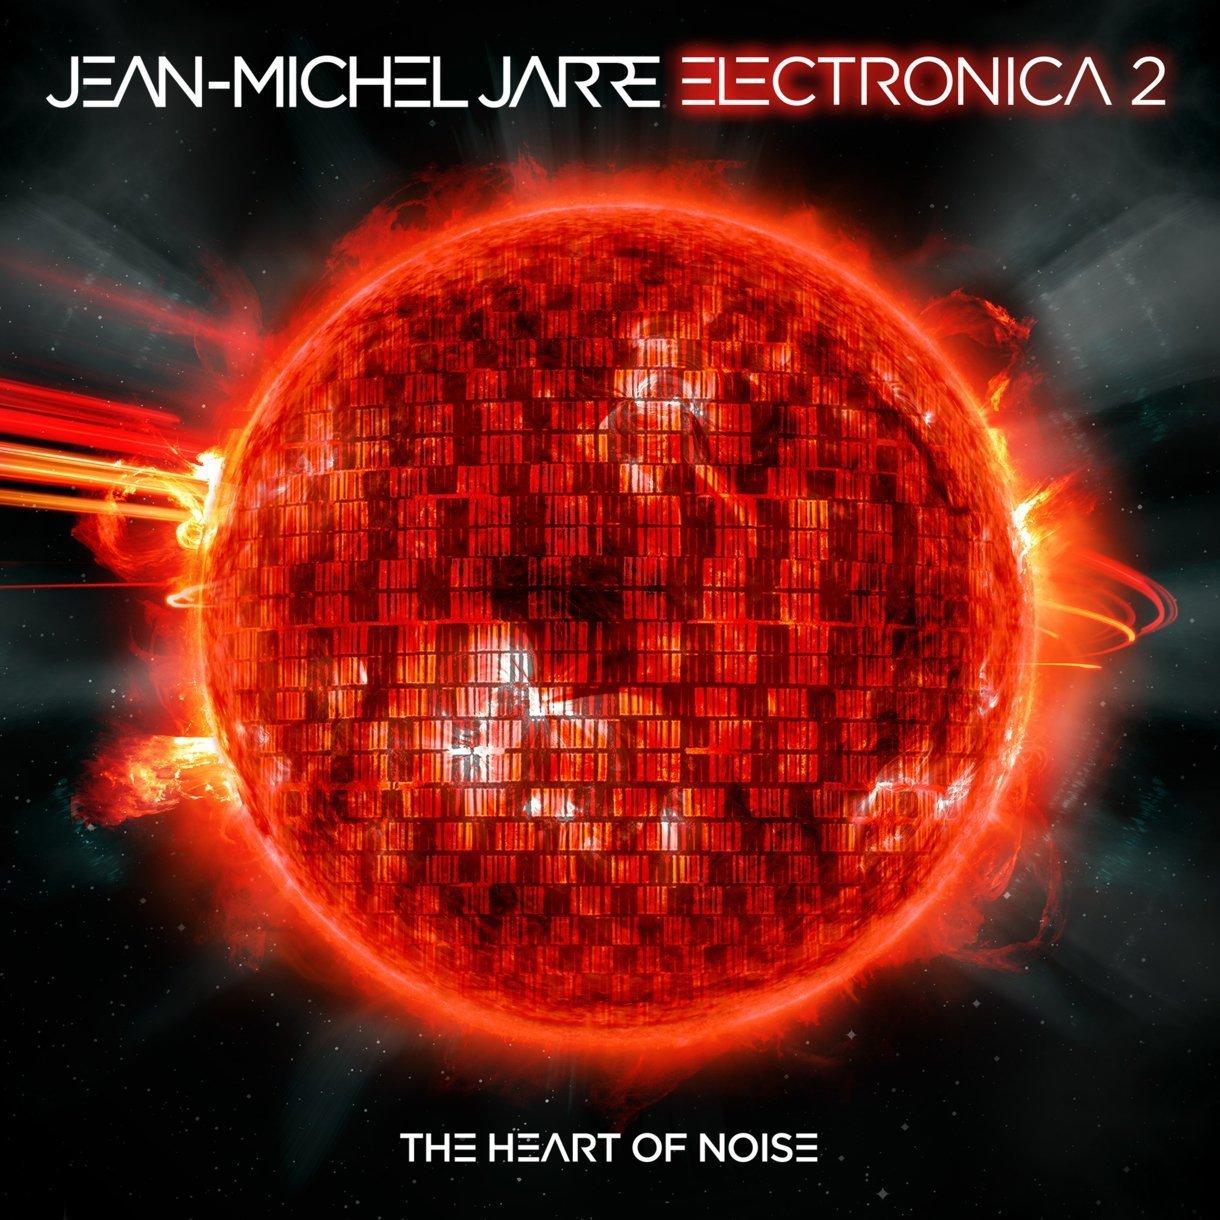 JEAN-MICHEL JARRE - ELECTRONICA 2 - THE HEART OF NOISE (LP)